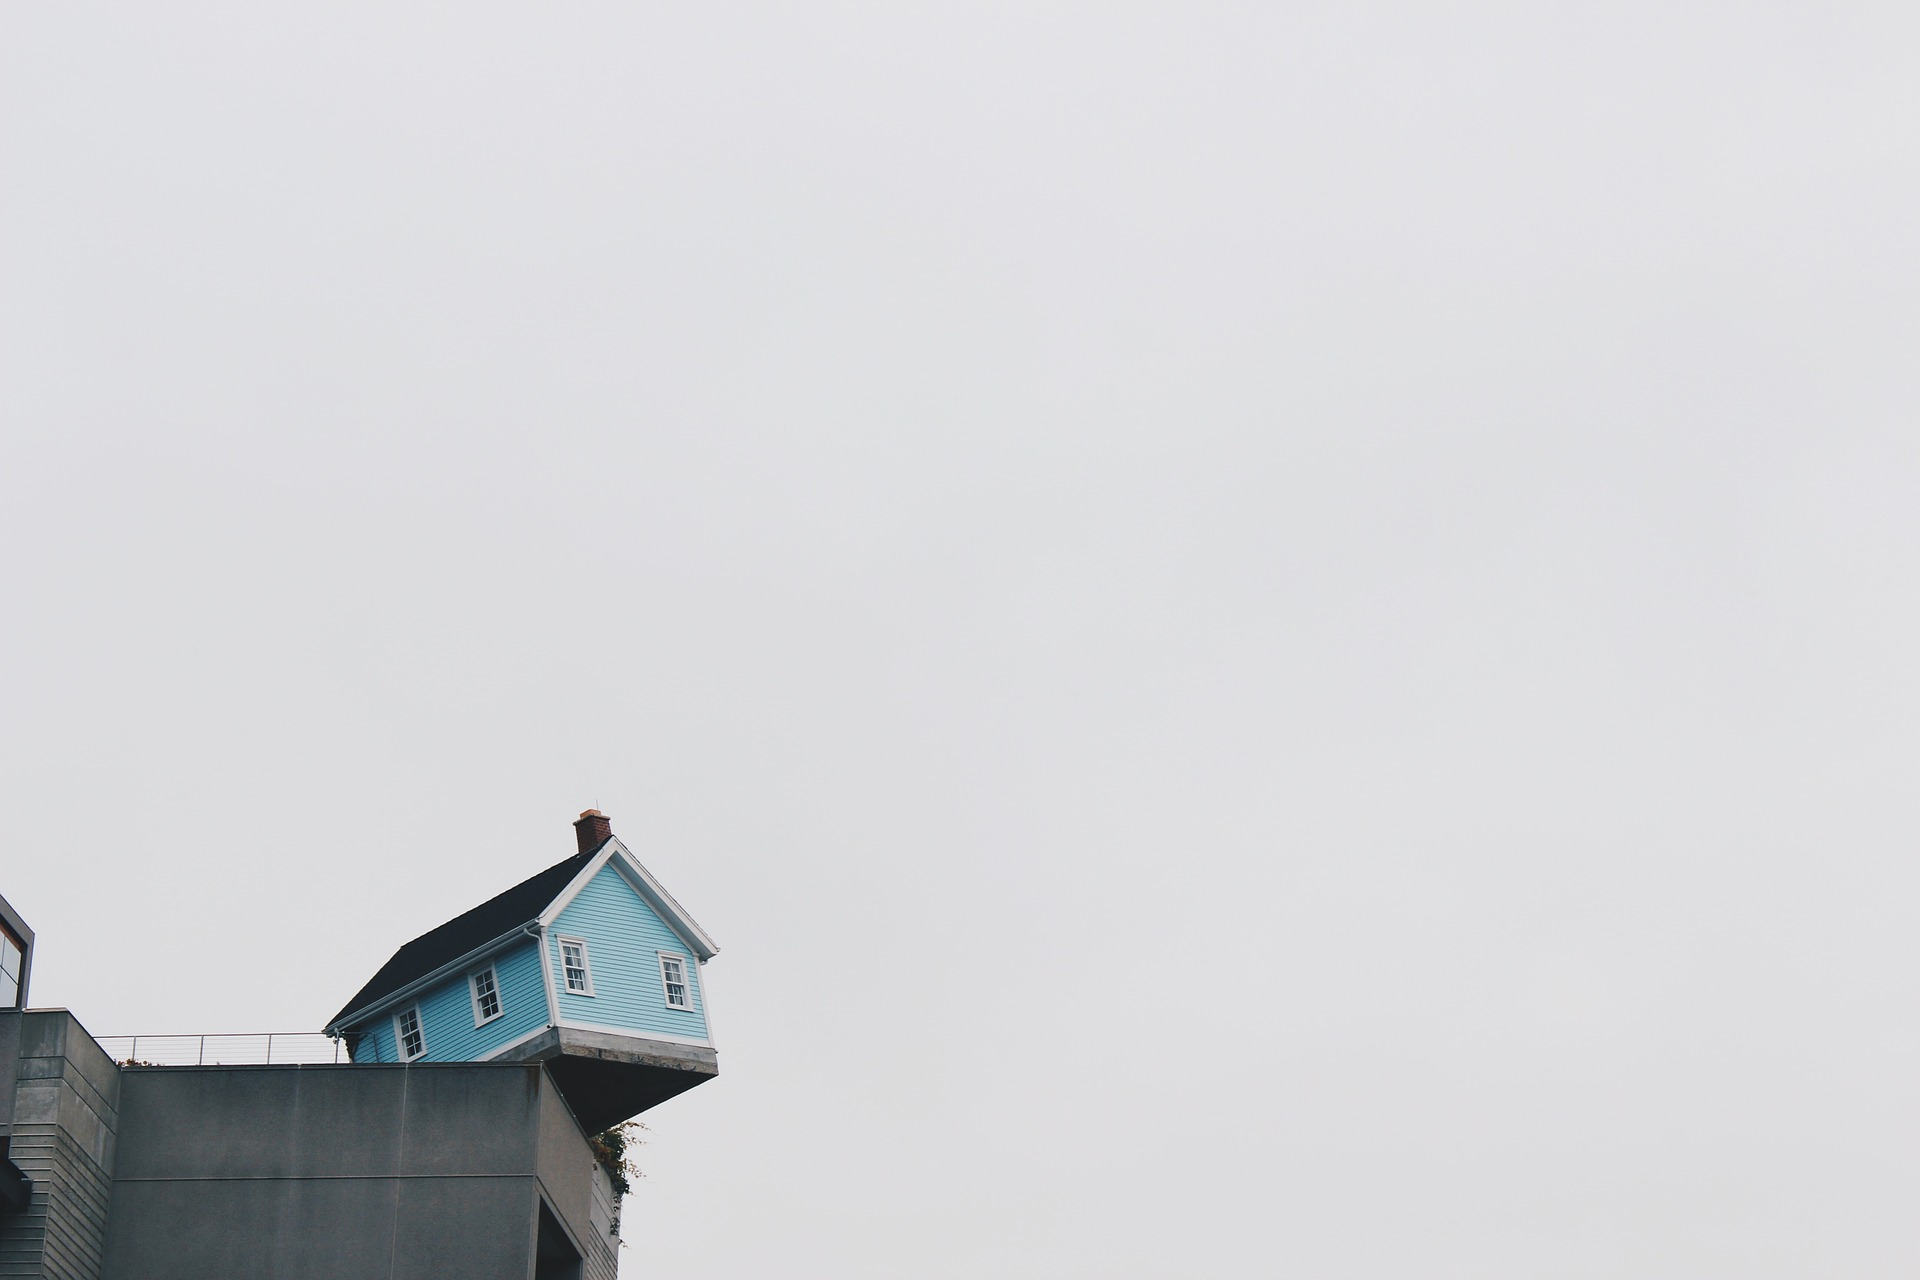 casa in bilico (002)